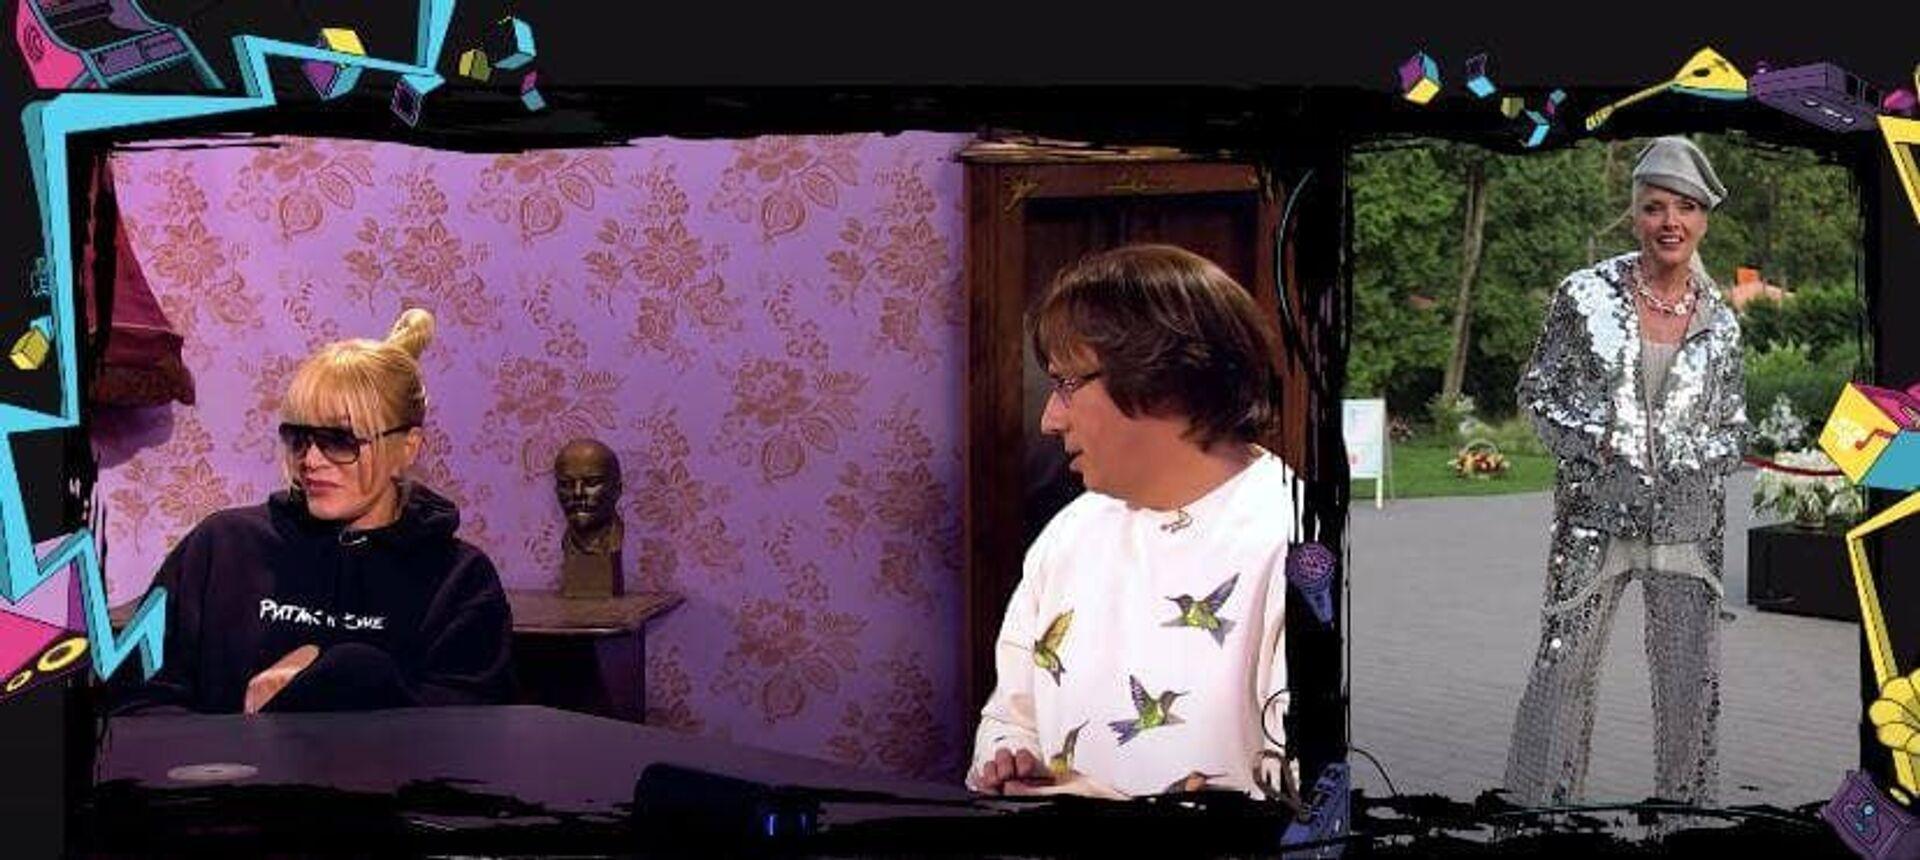 Ходячий диско-шар: Максим Галкин потроллил наряд Лаймы Вайкуле - Sputnik Грузия, 1920, 04.06.2021